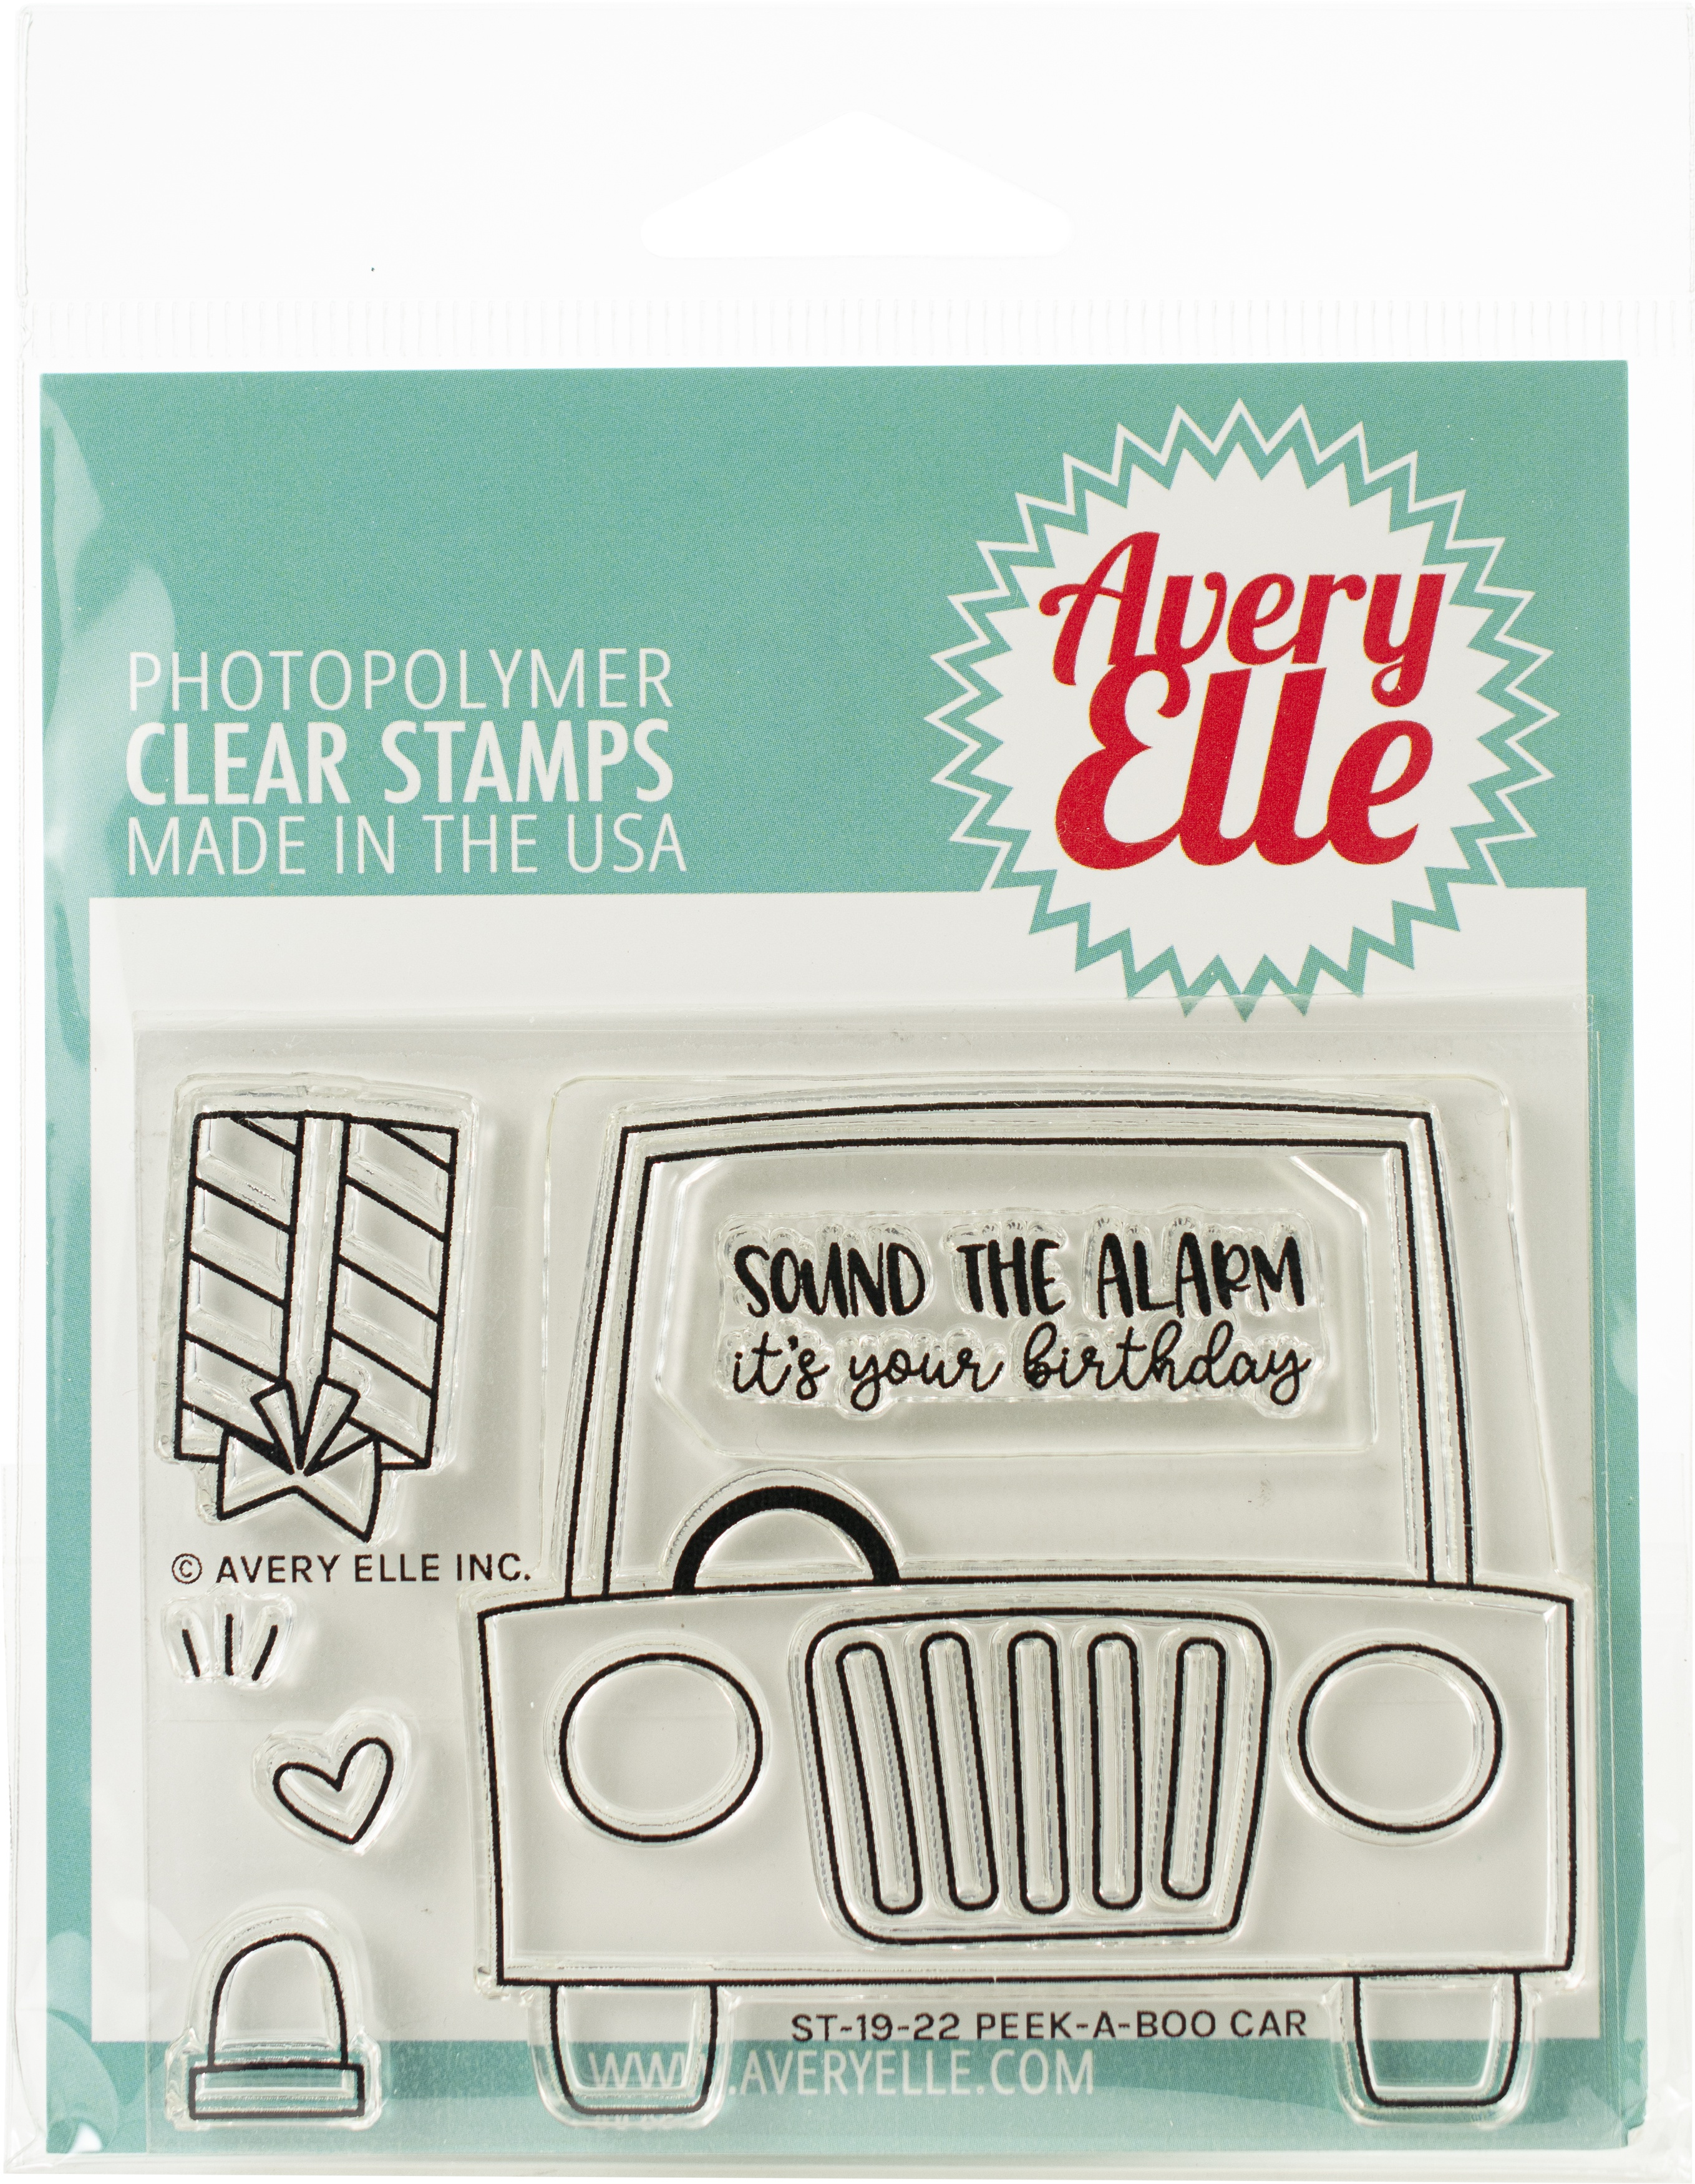 Avery Elle Clear Stamp Set 4X3-Peek-A-Boo Car